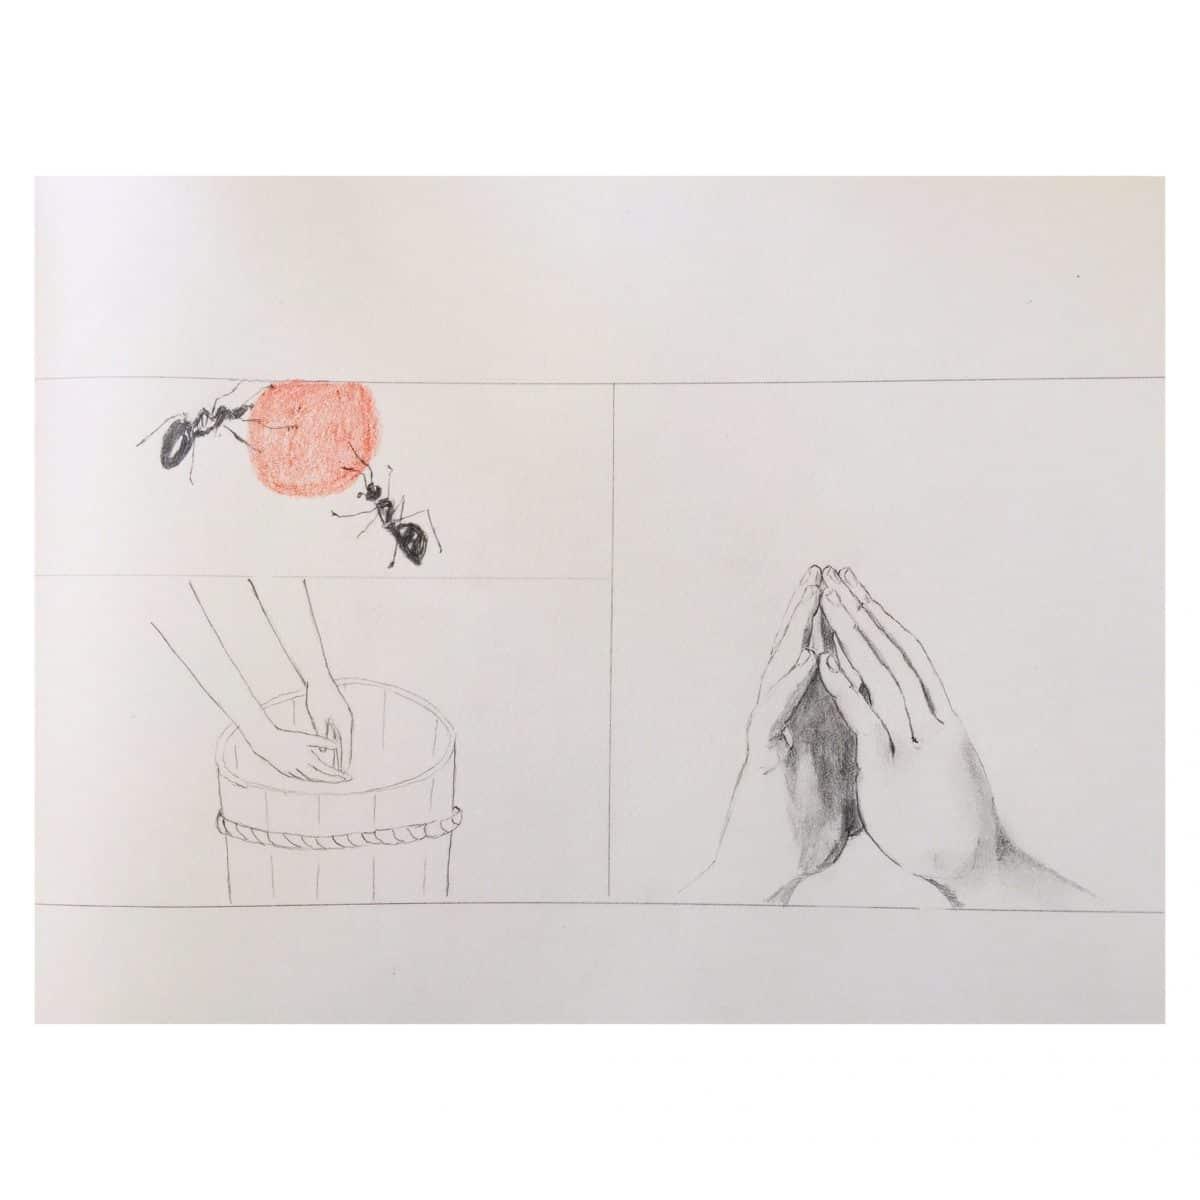 dibujo-a-pertir-de-un-poema-de-luna-miguel